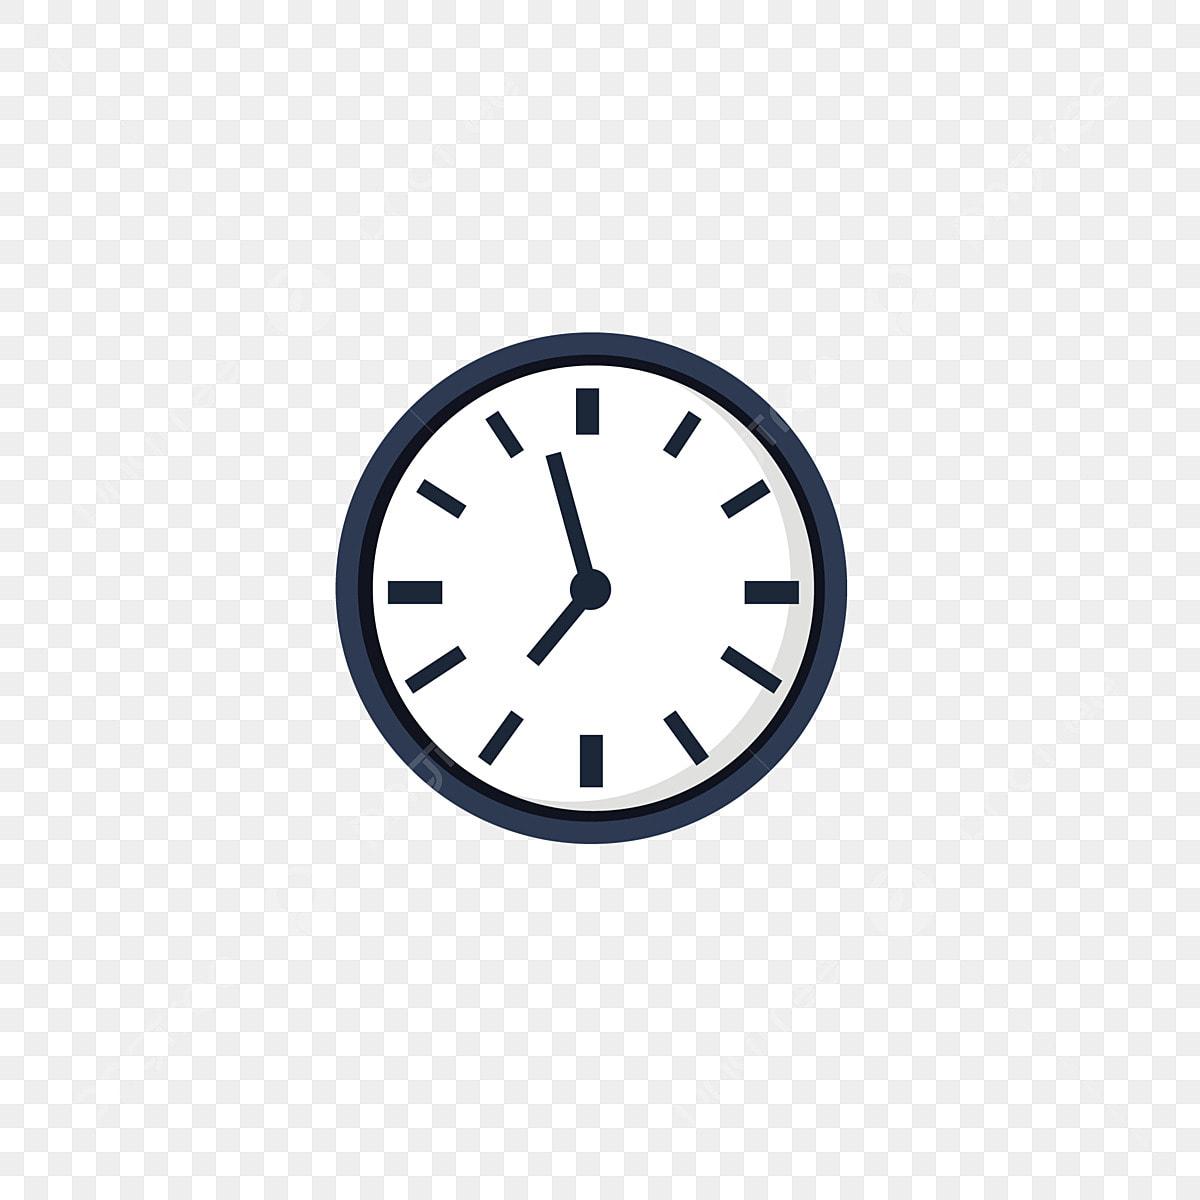 Horloge De Bureau Originale bureau décoration d'horloge horloges de bureau horloges